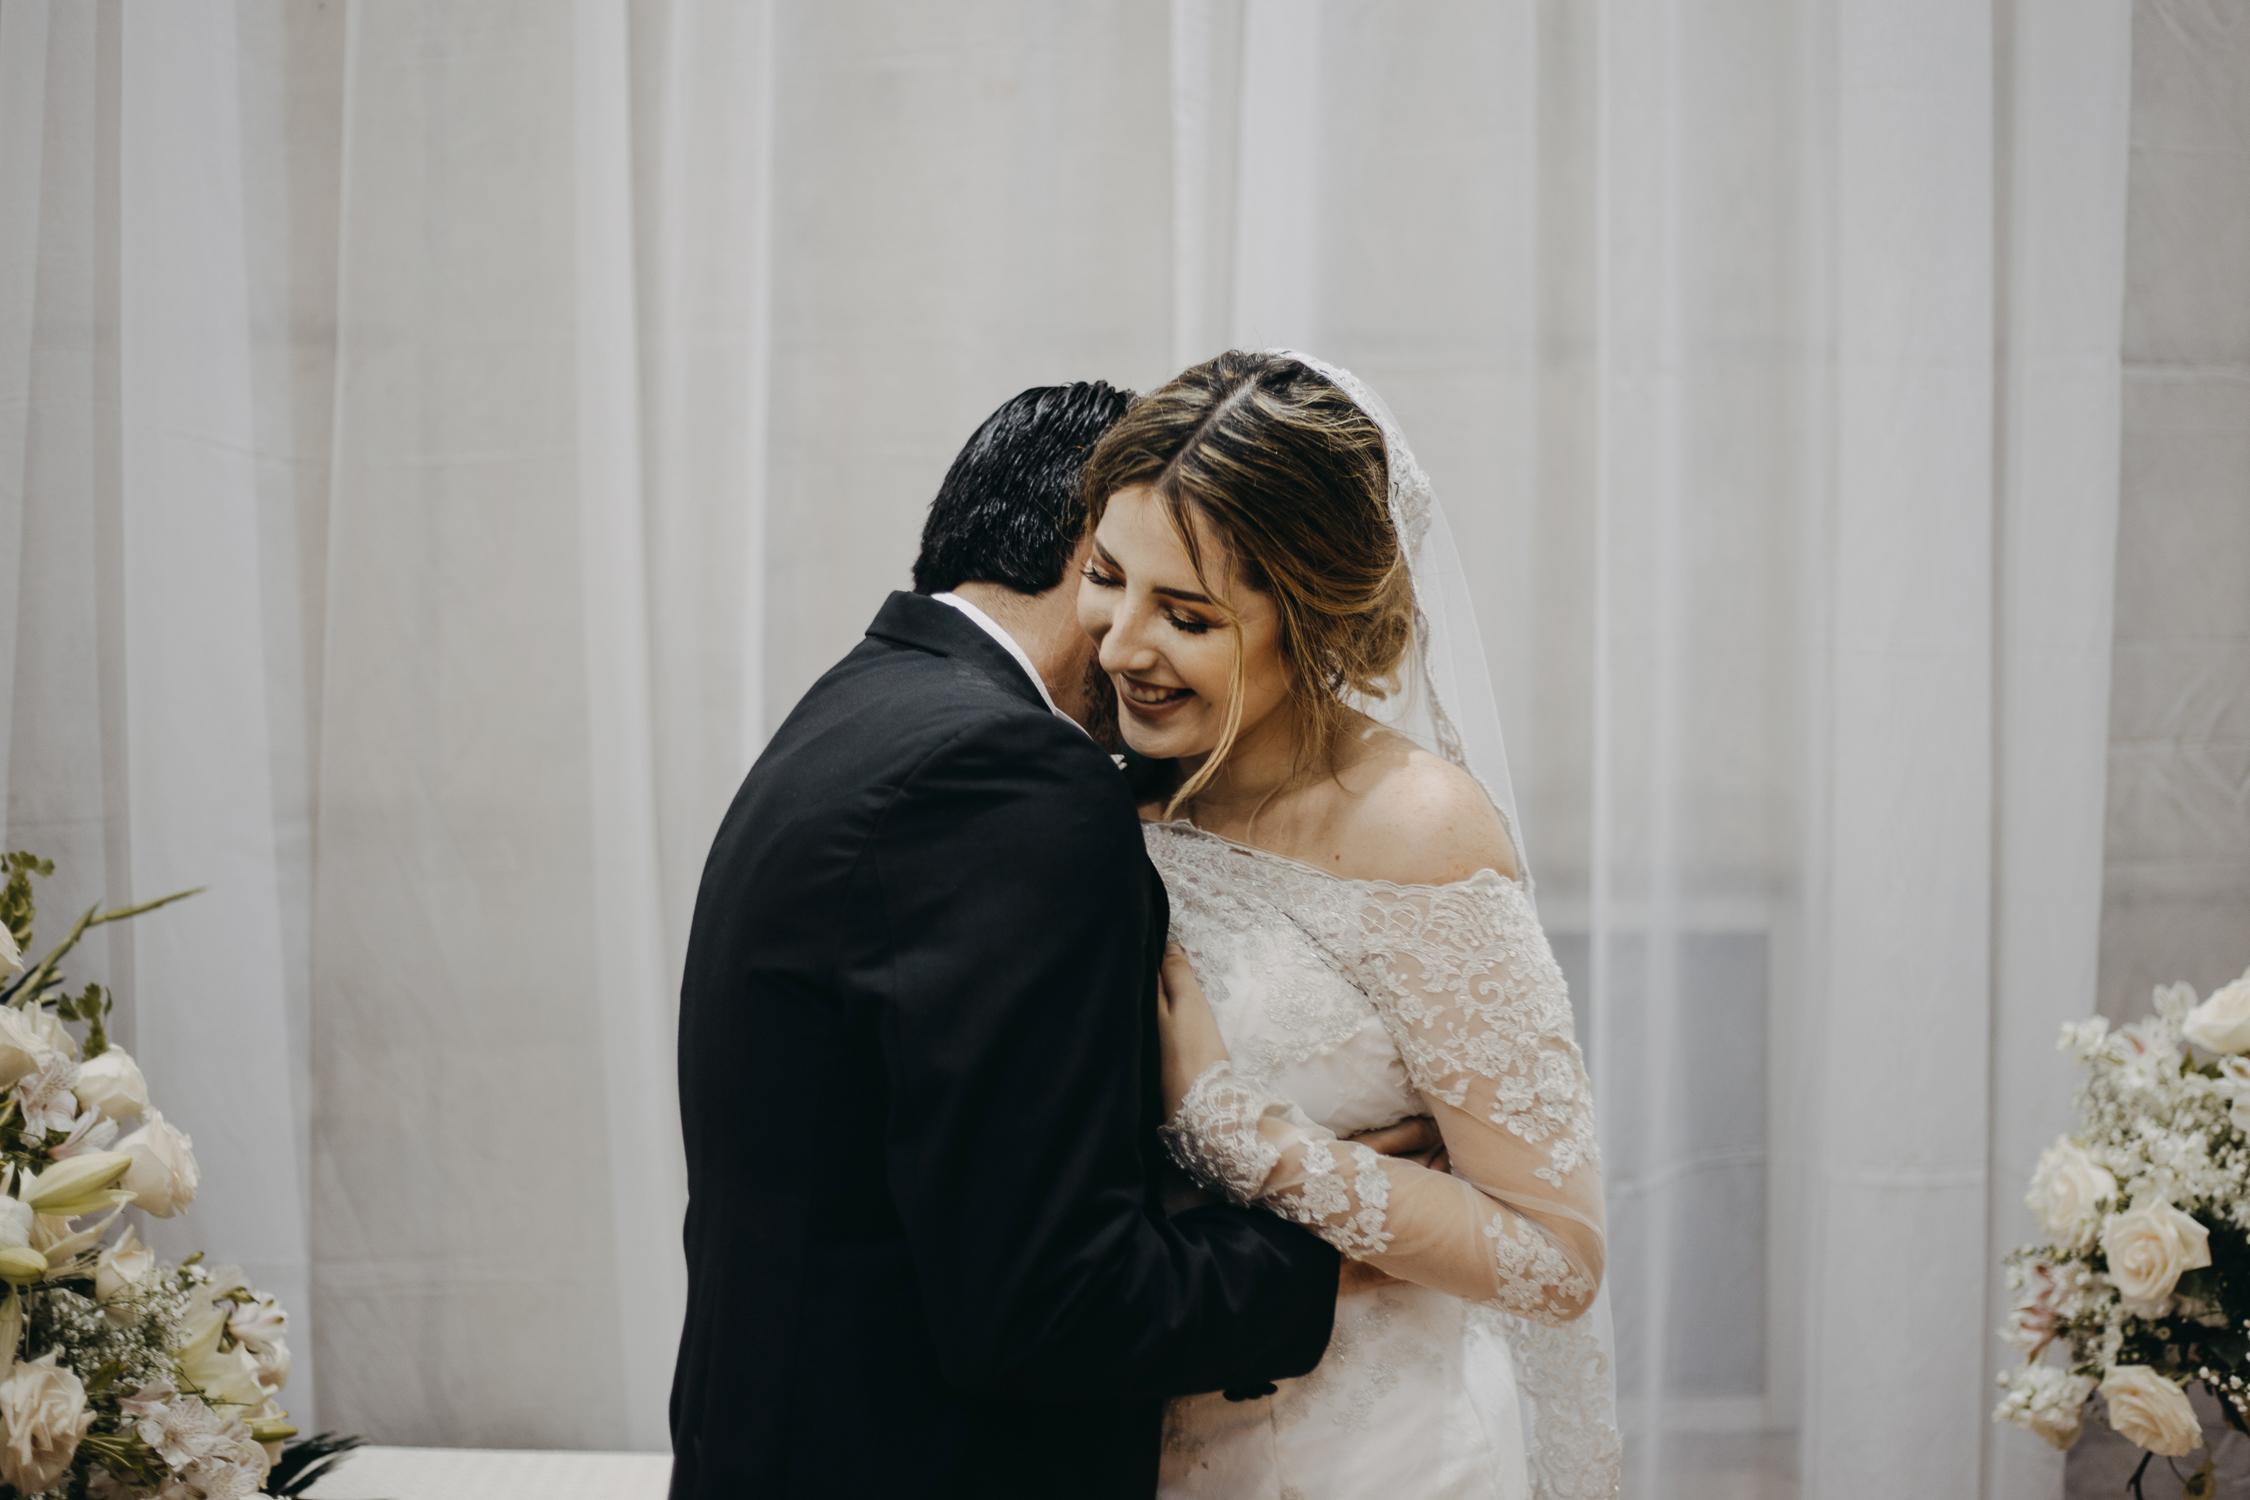 Michelle-Agurto-Fotografia-Bodas-Ecuador-Destination-Wedding-Photographer-Vicky-Javier-192.JPG